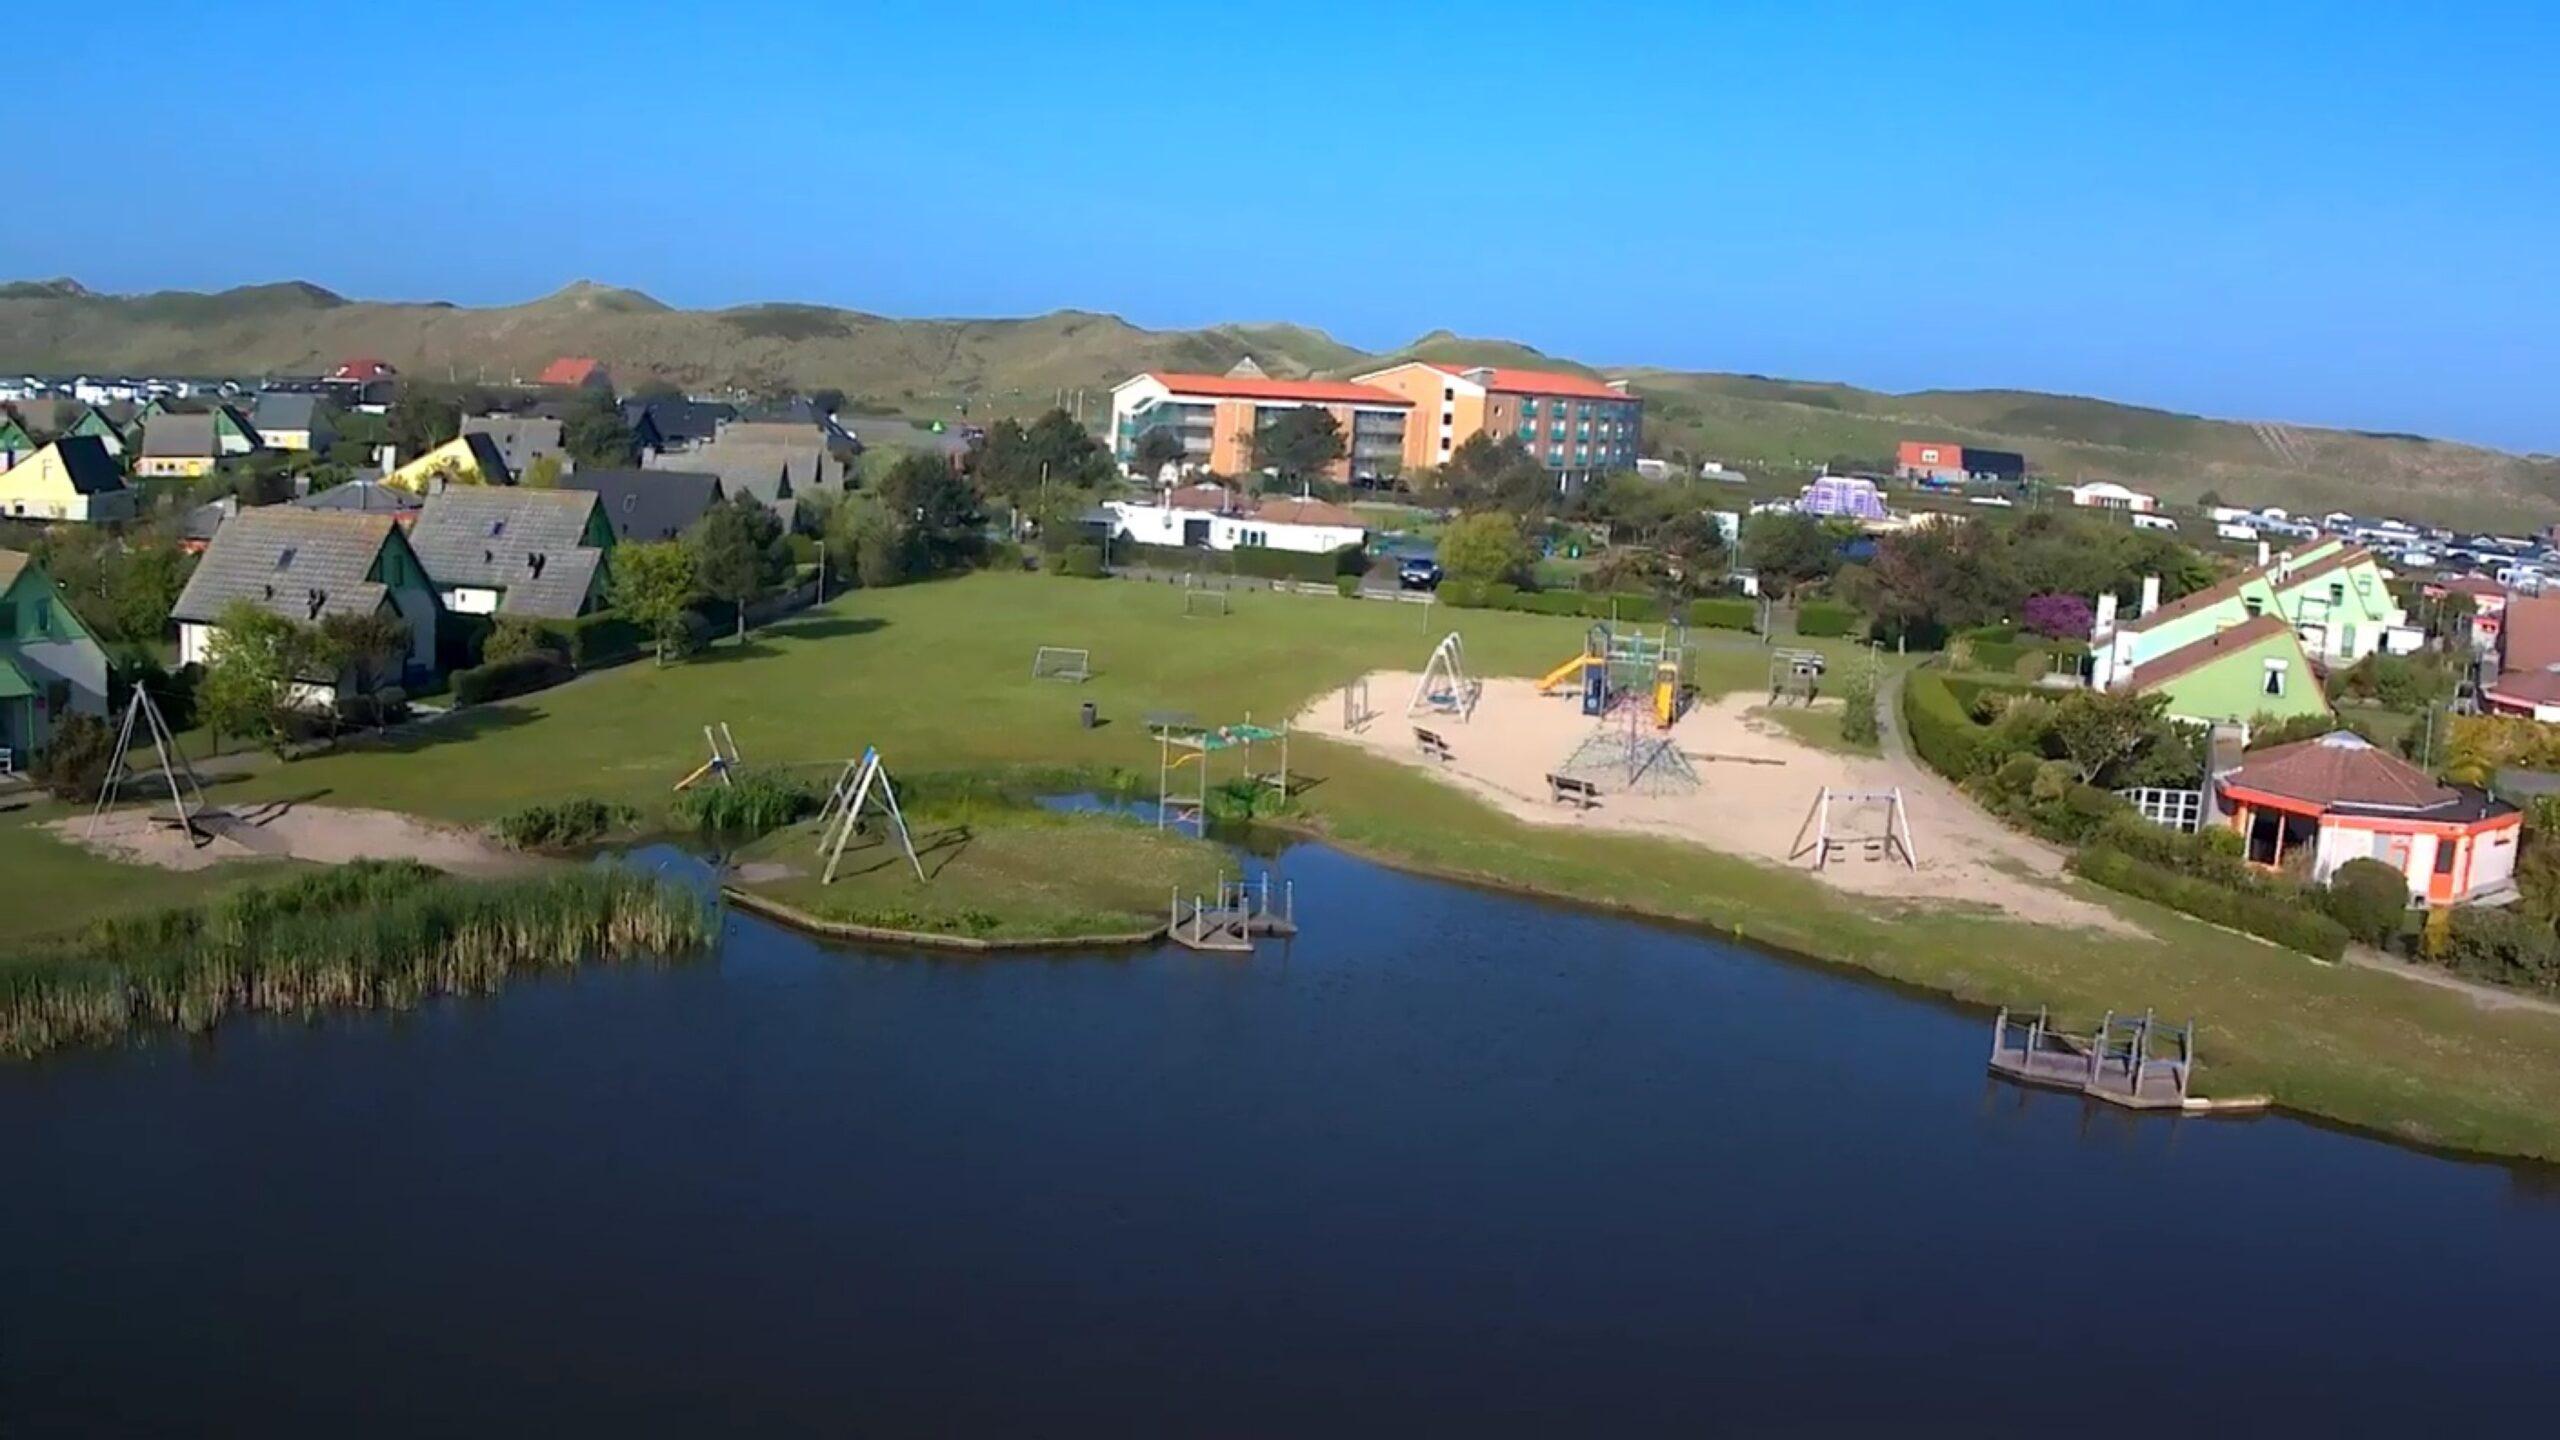 Luftbild Ferienpark Strandslag